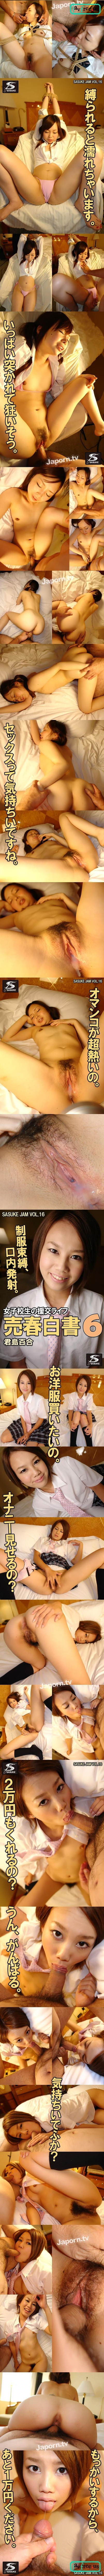 [SSKJ-016] サスケジャム Vol.16 売春白書 006 : 菅野すみれ,君島百合 - image SSKJ-016b on https://javfree.me